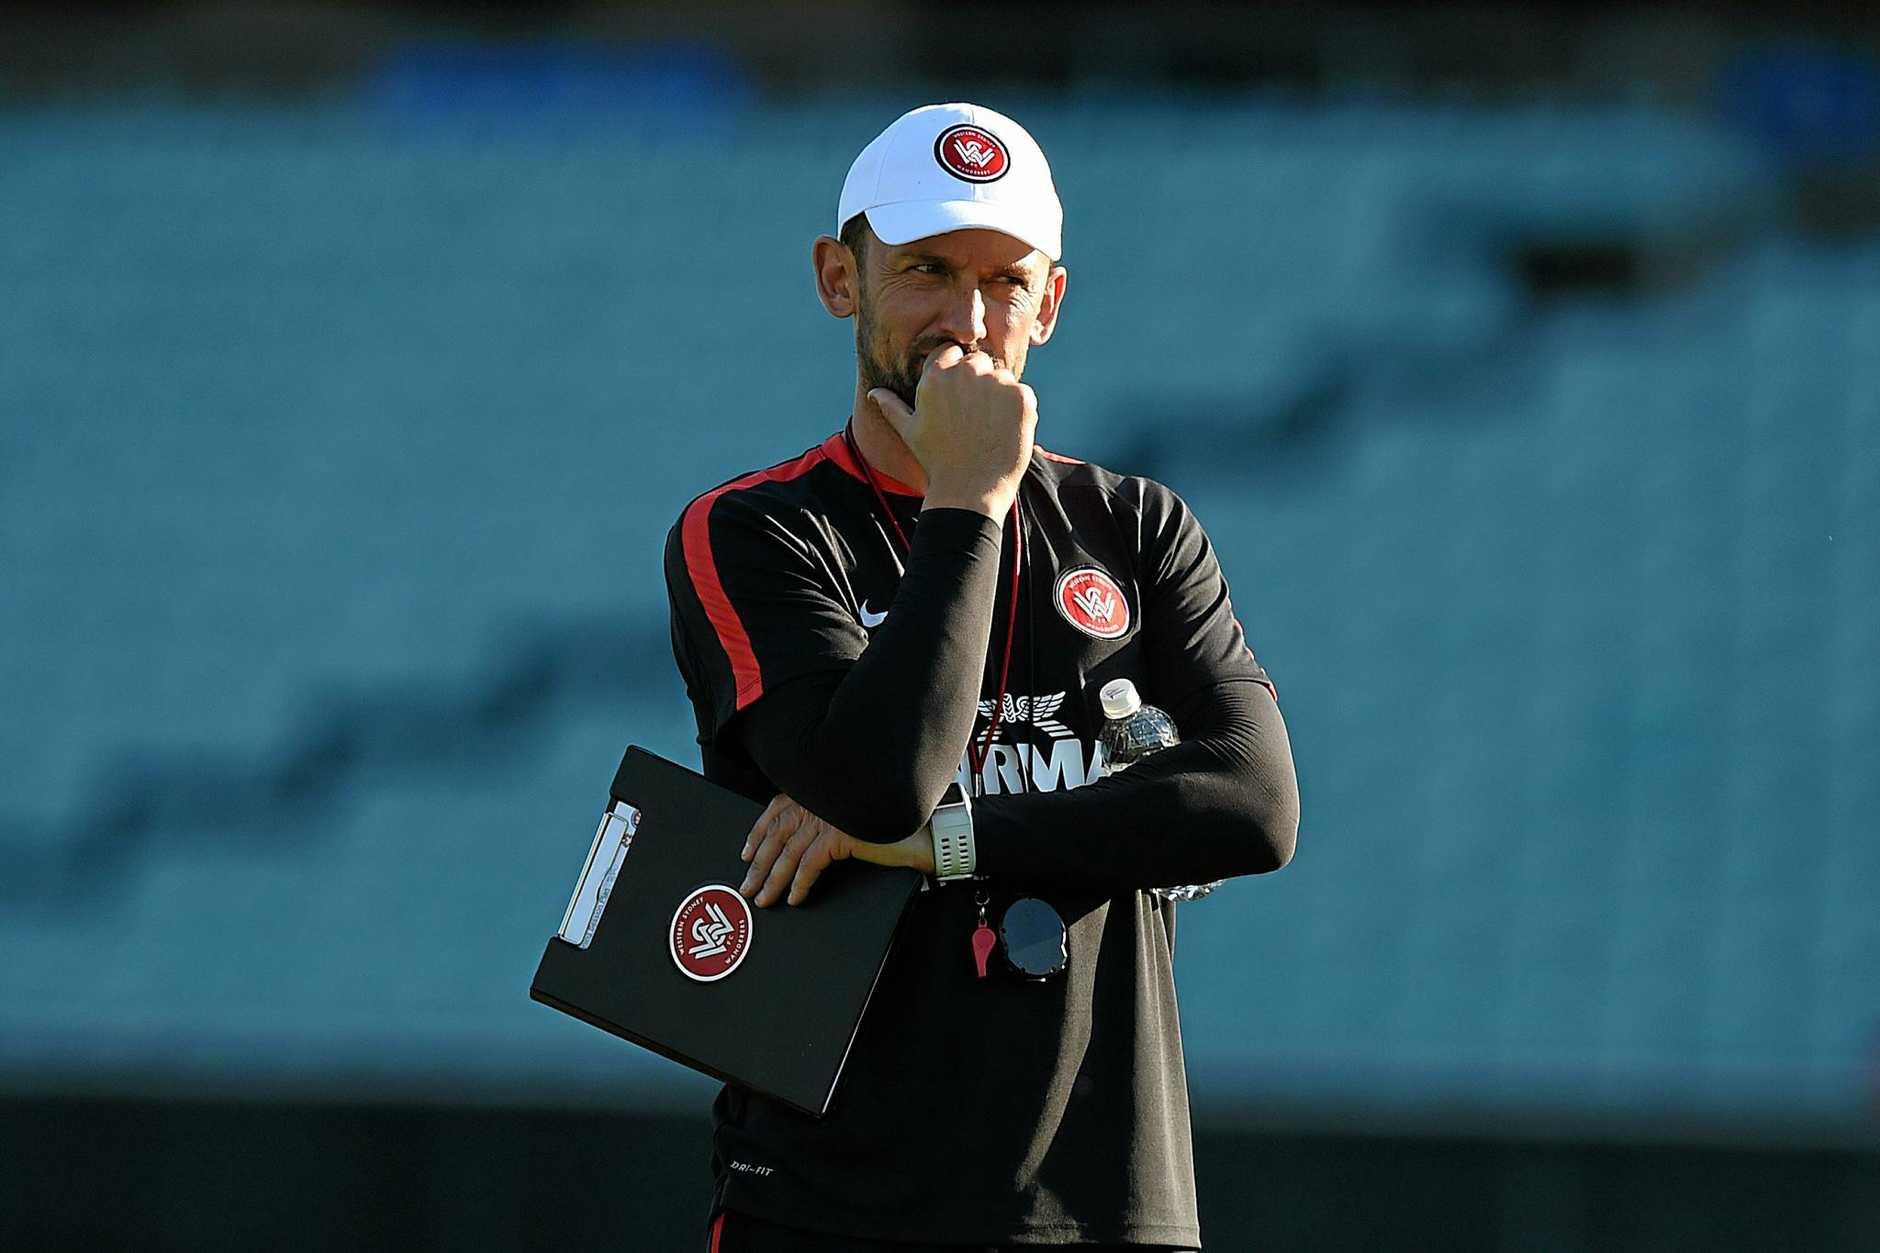 Western Sydney Wanderers coach Tony Popovic.